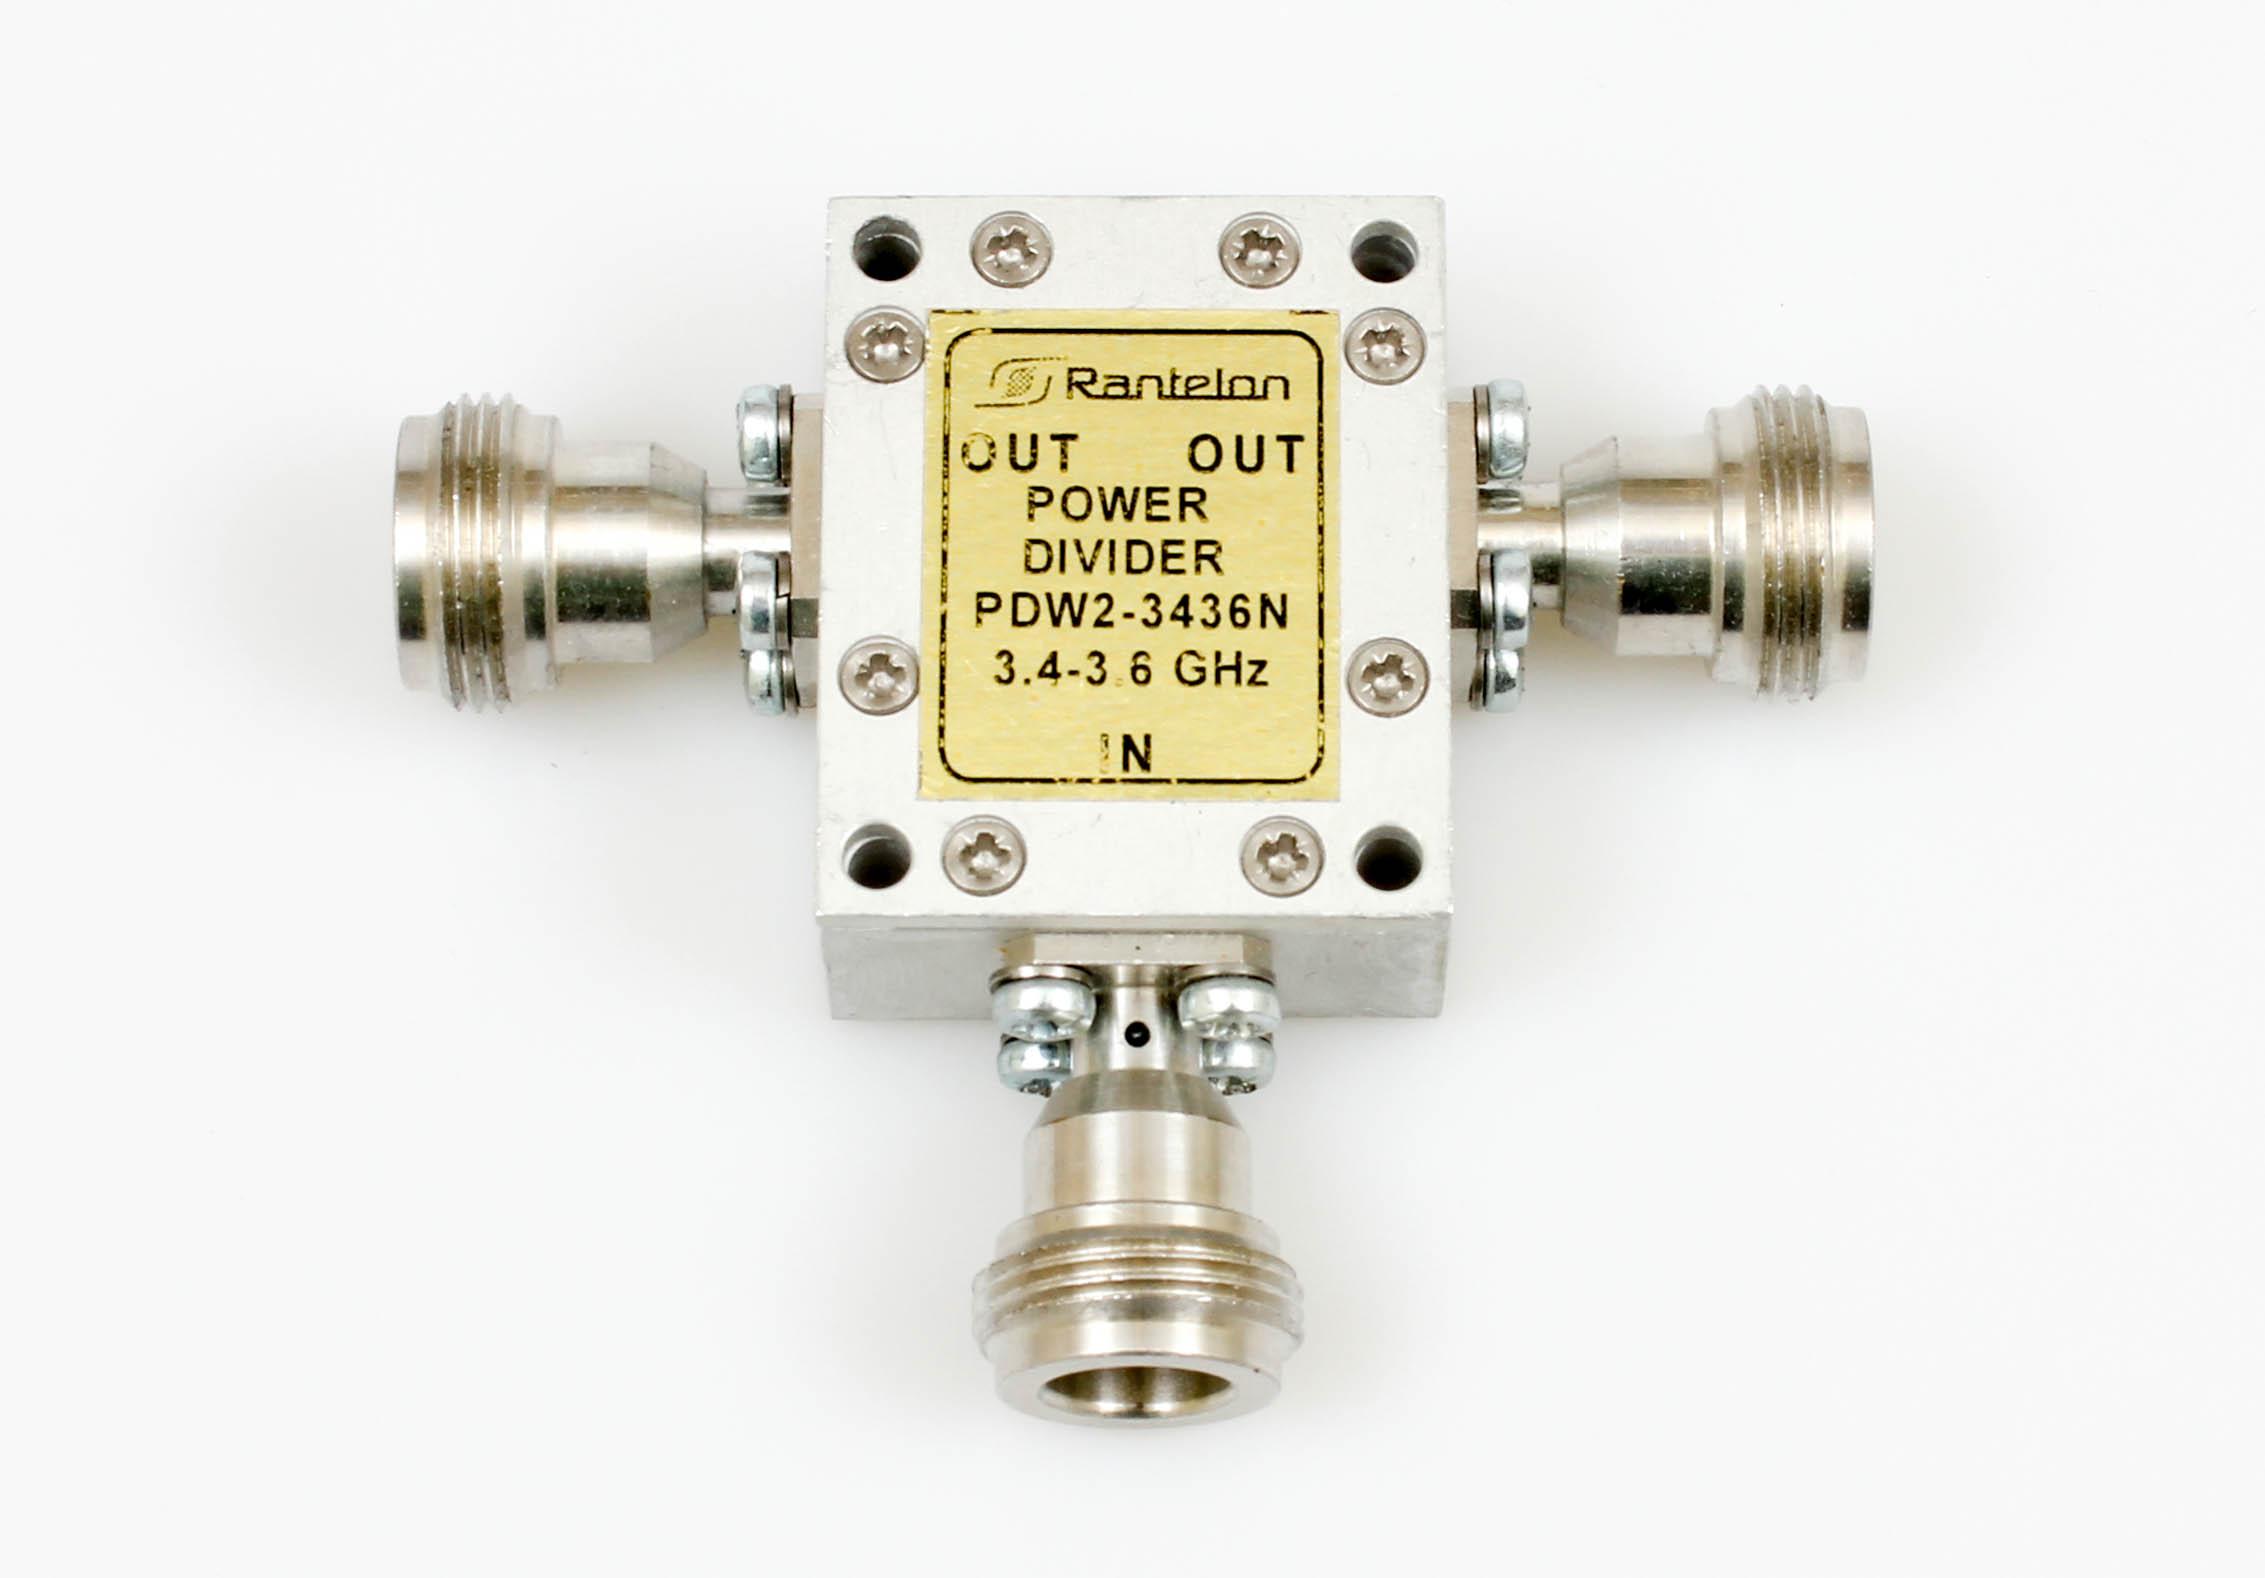 PDW2-3436N